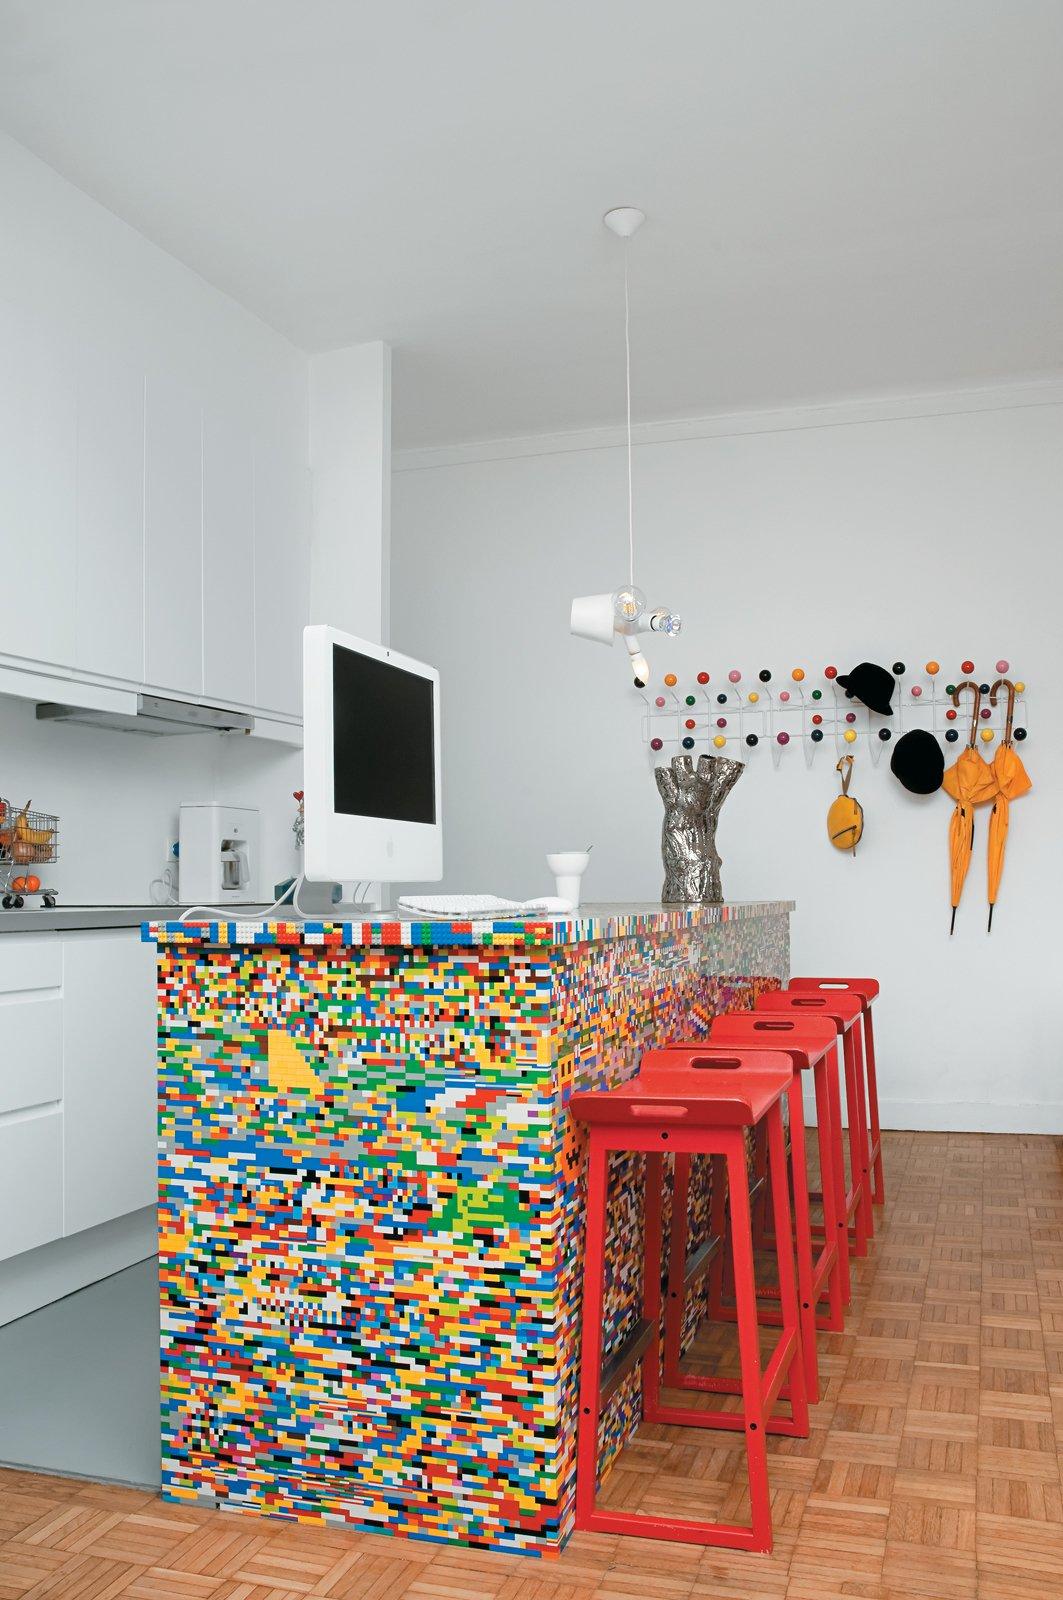 #interior #design #interiordesign #modern #kitchen #legos #color #colorful #redchairs #countertop #counter #stool #desk #coathanger #paris #philipperossetti #simonpillard #munchausen #kitchenisland   36+ Interior Color Pop Ideas For Modern Homes by Dwell